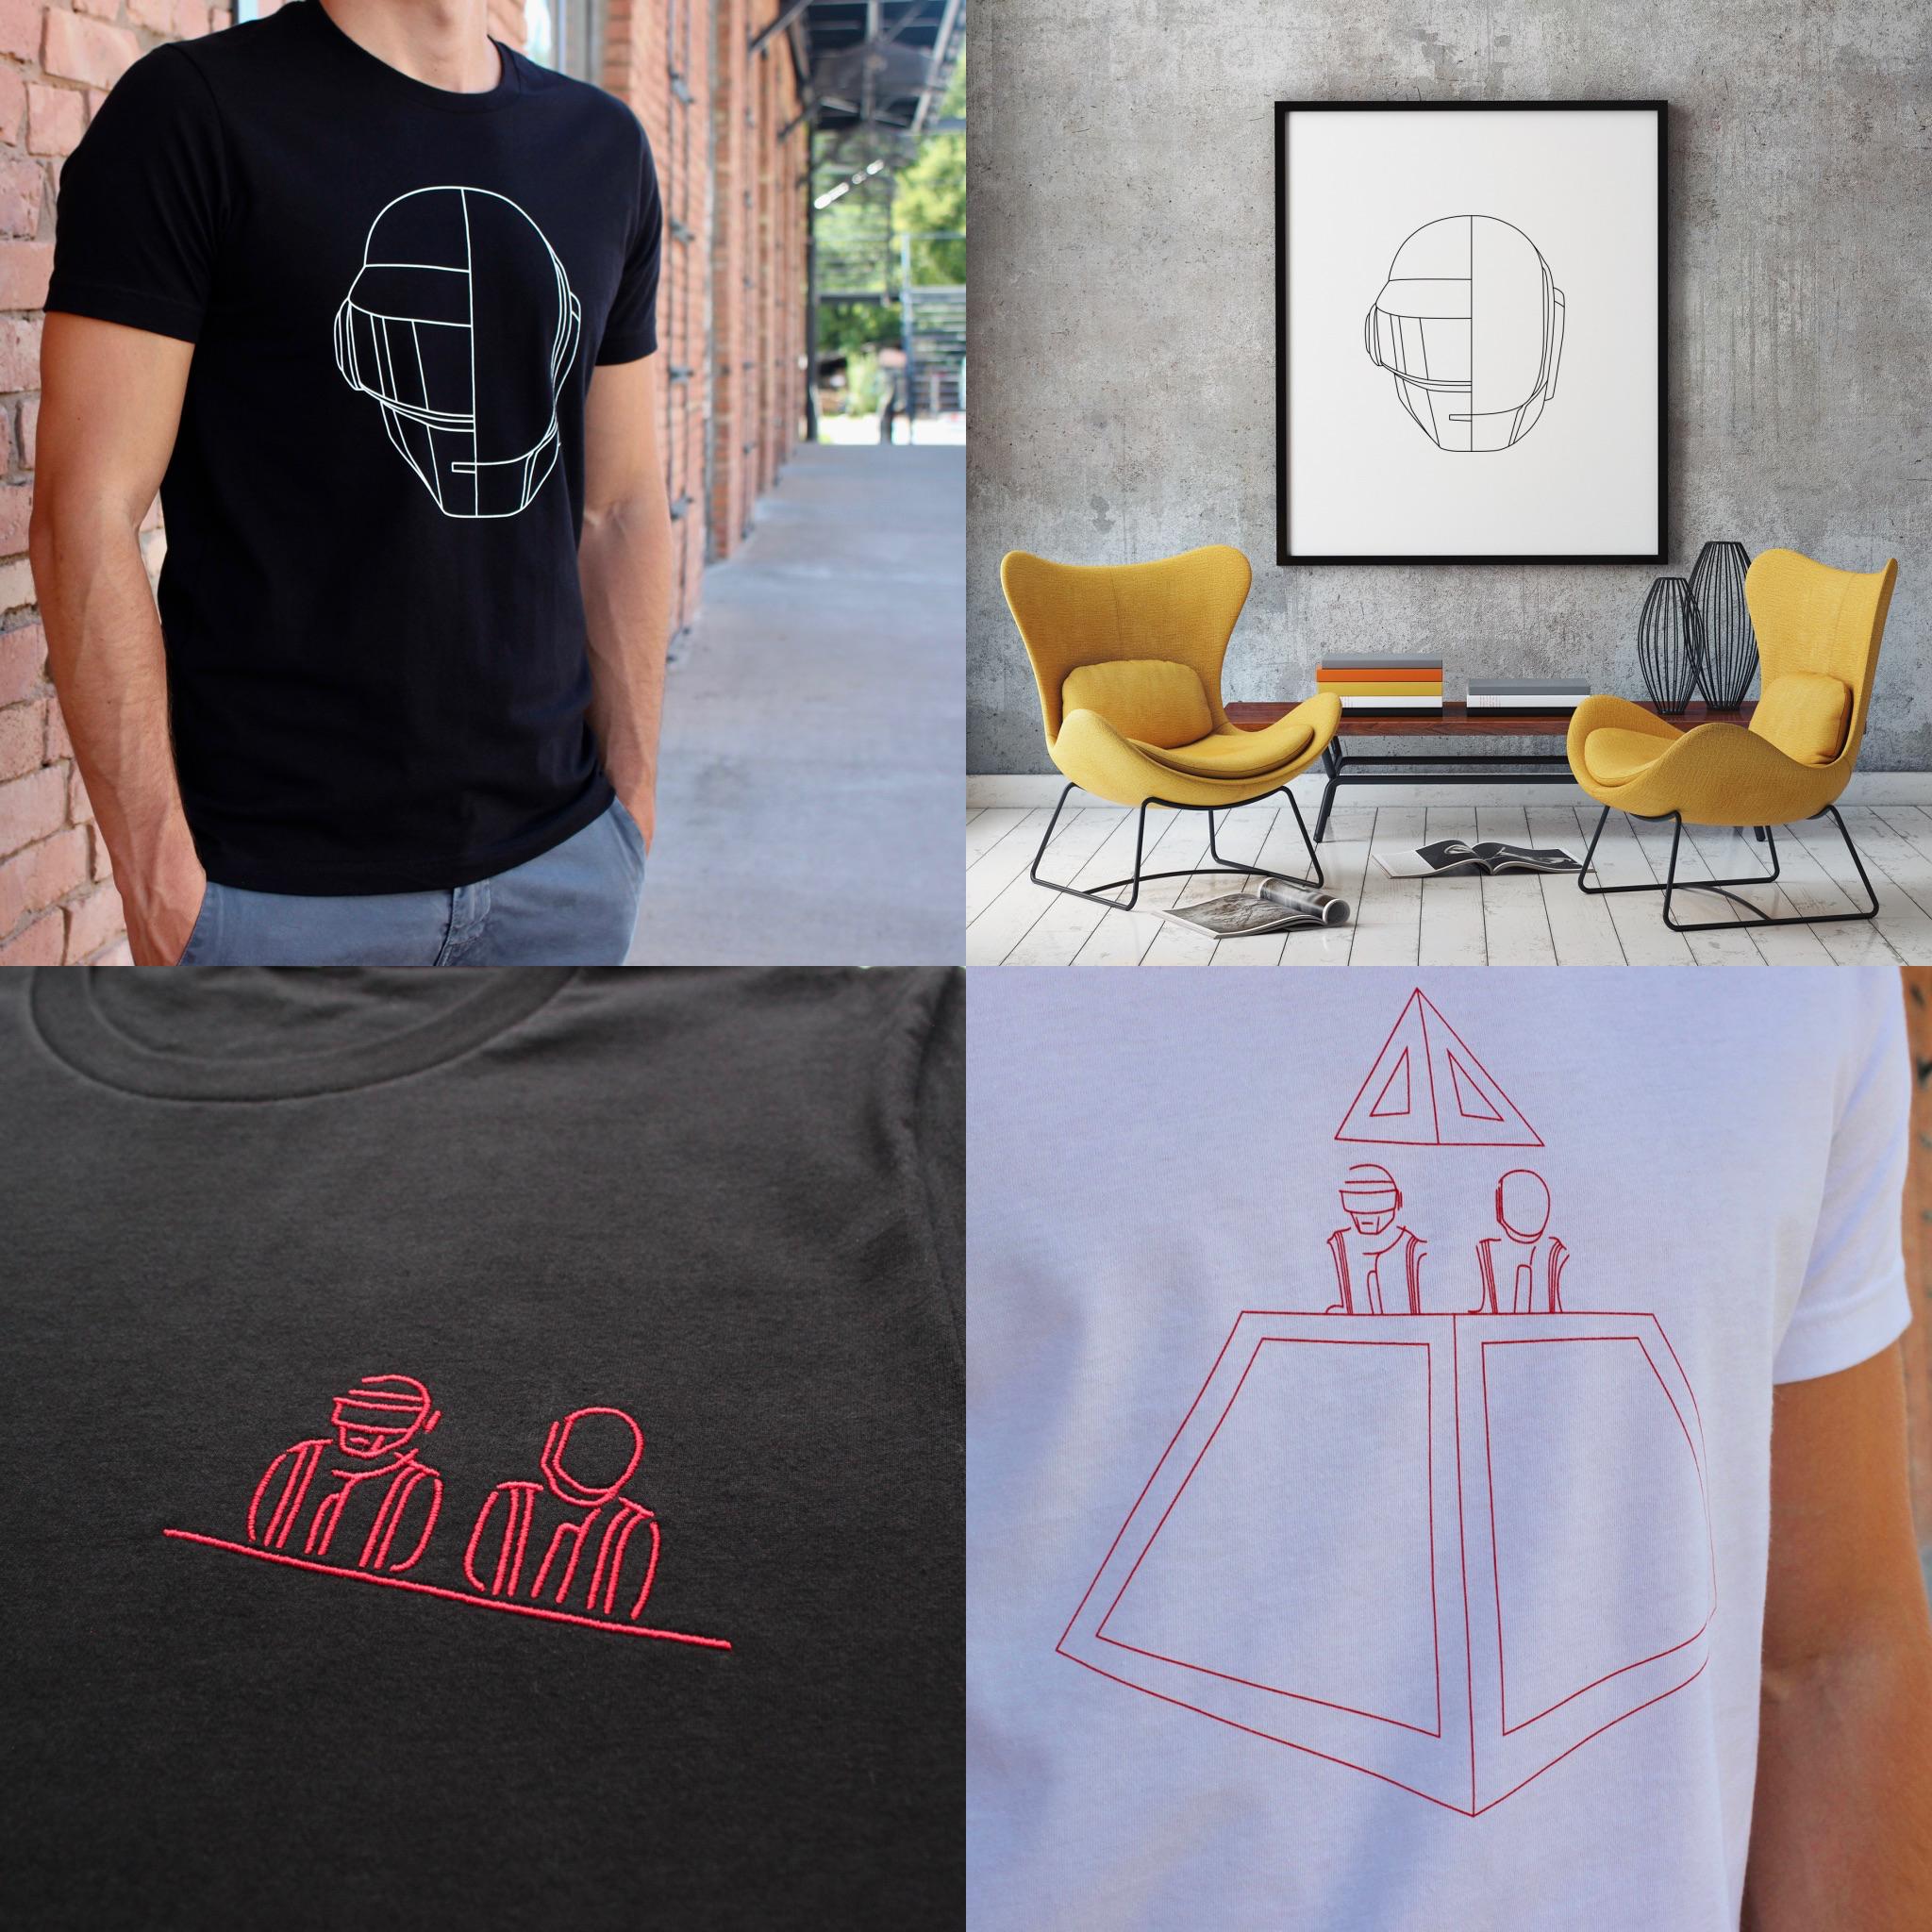 Bei Daftprints 20% auf alles - Daft Punk inspirierte Plataken un Kleidung.